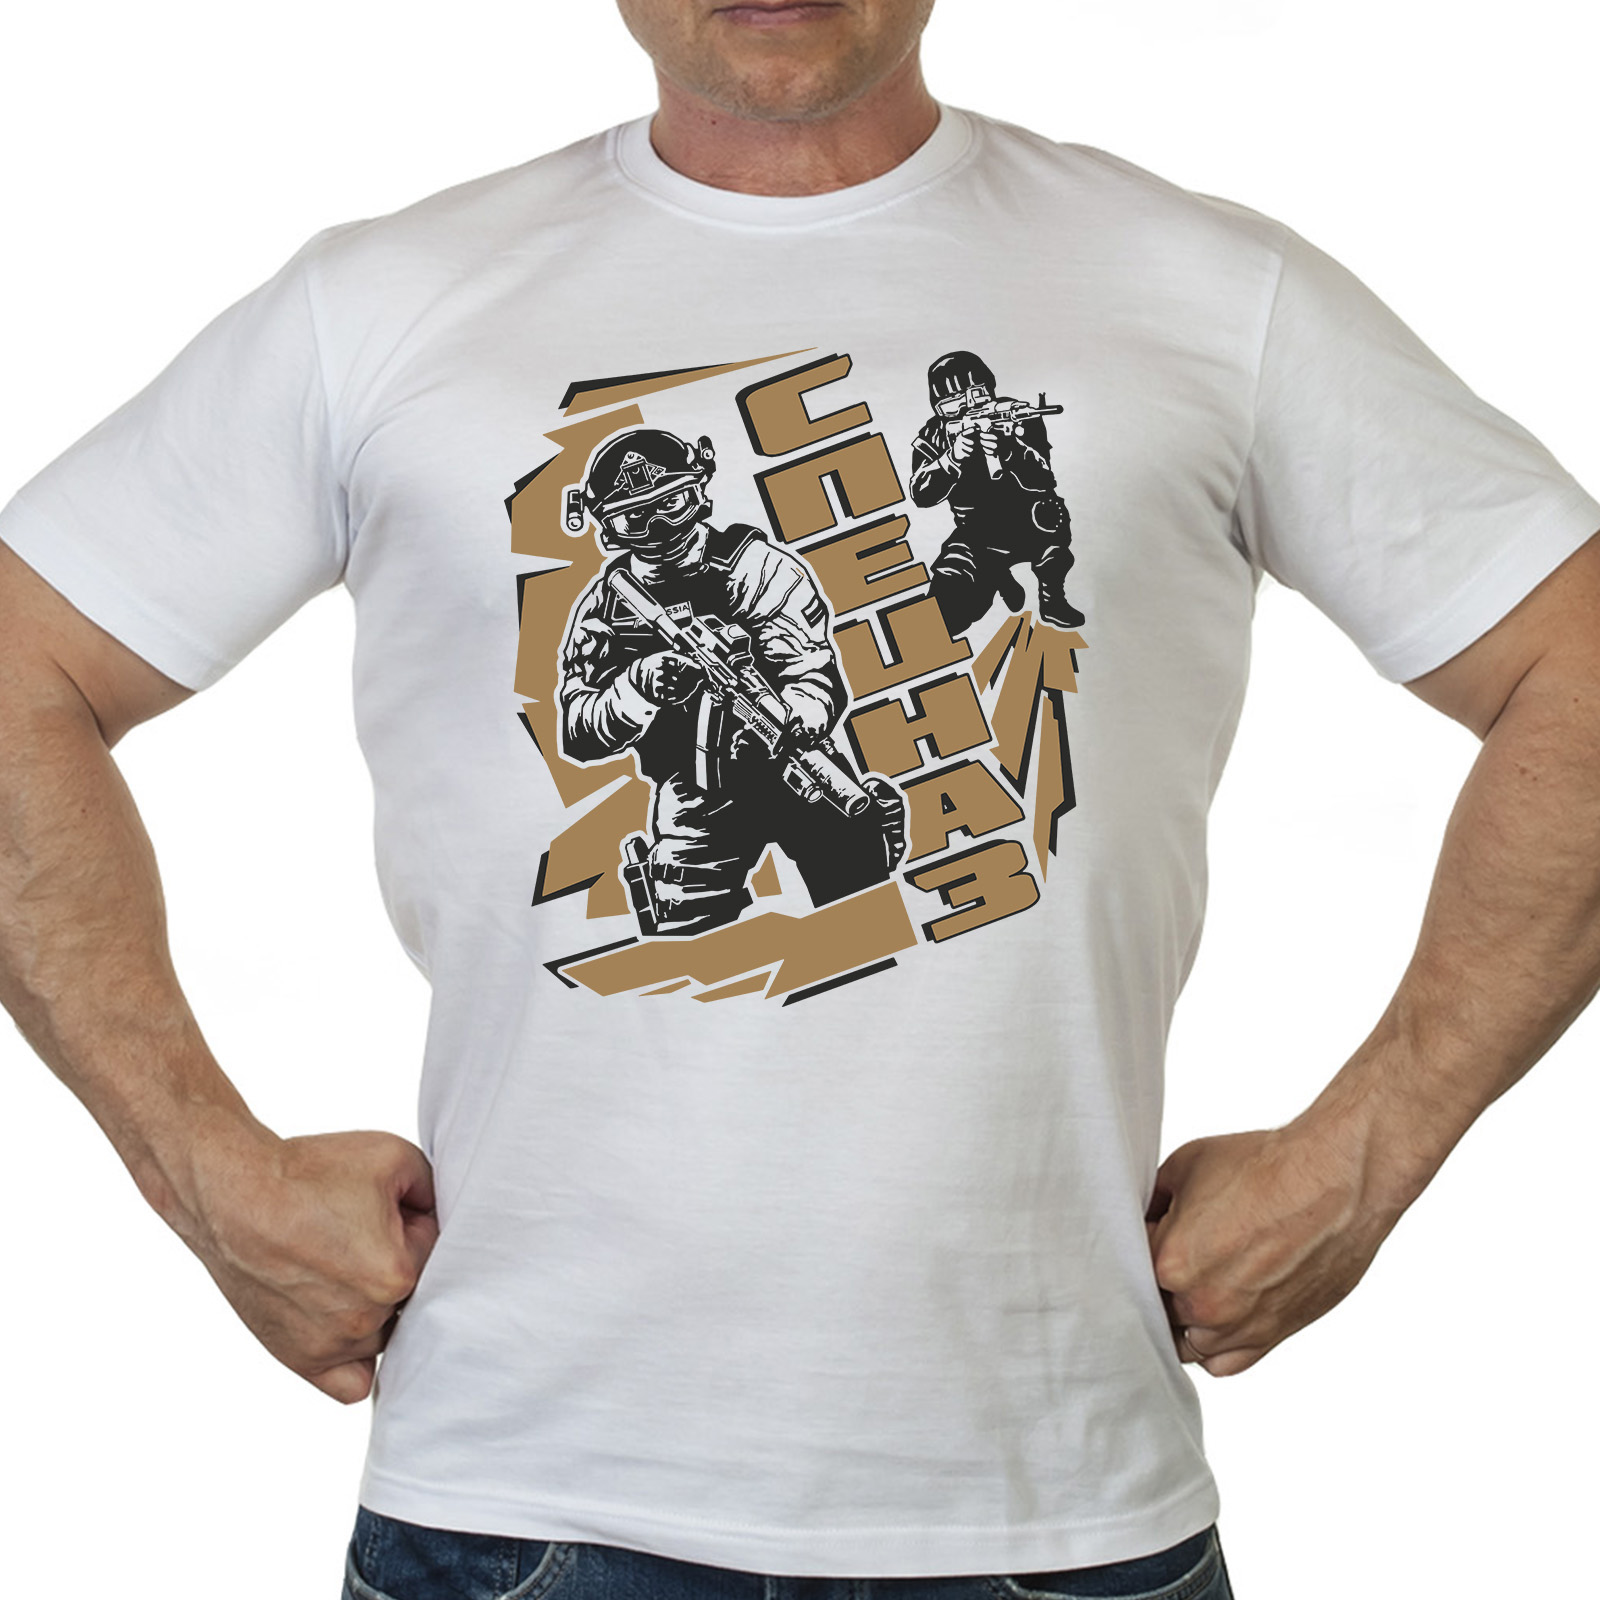 Мужская белая футболка с крутым принтом Спецназ